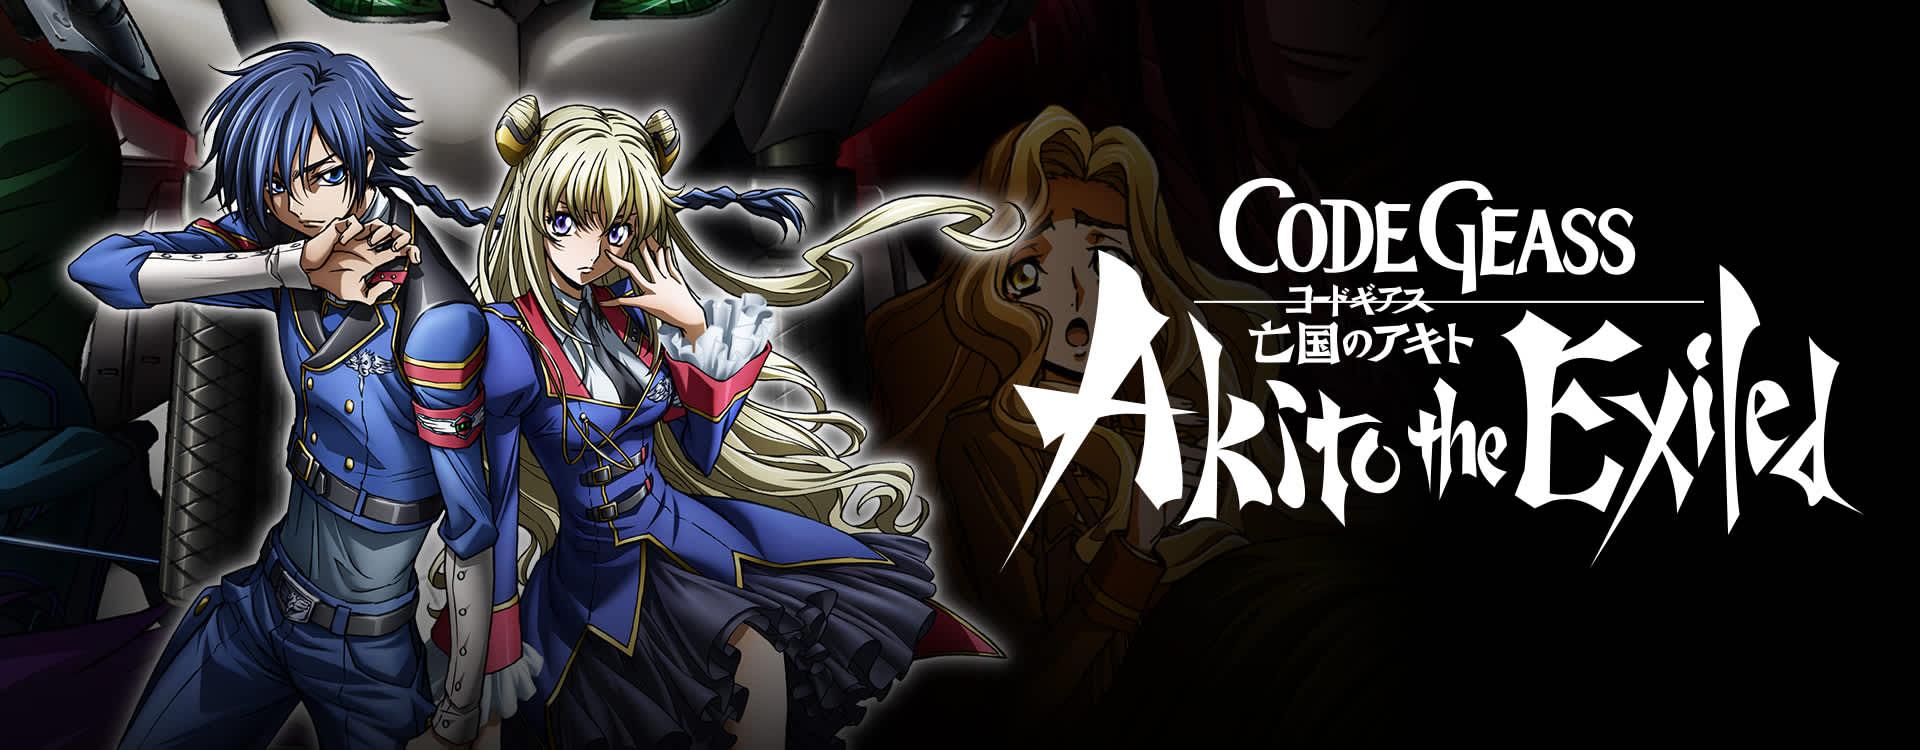 code geass akito the exiled episode 1 eng sub